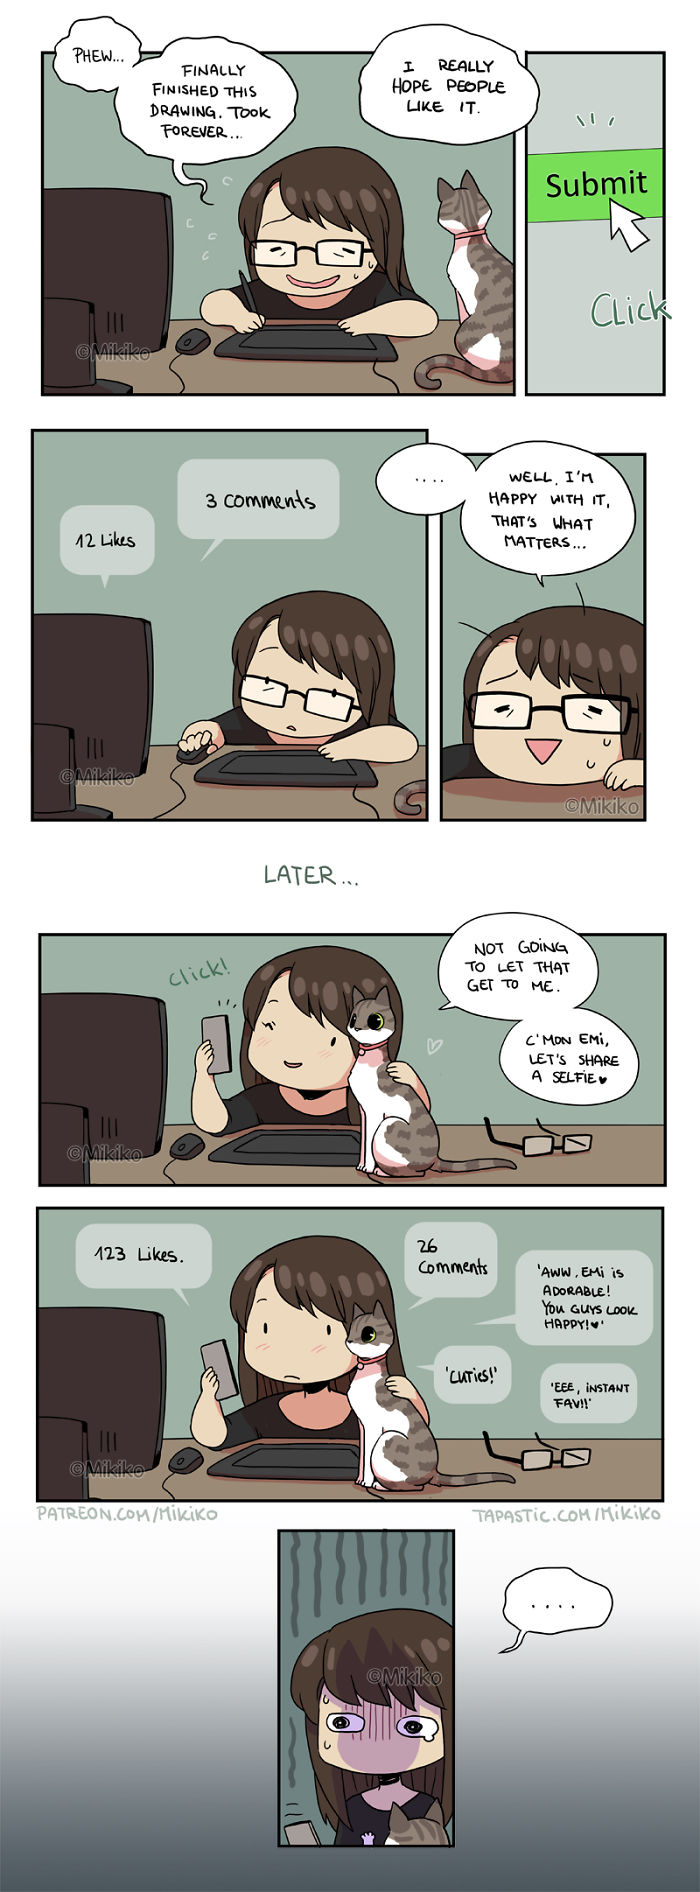 Artist-Life-Comics-Zombiesmile-Mikiko